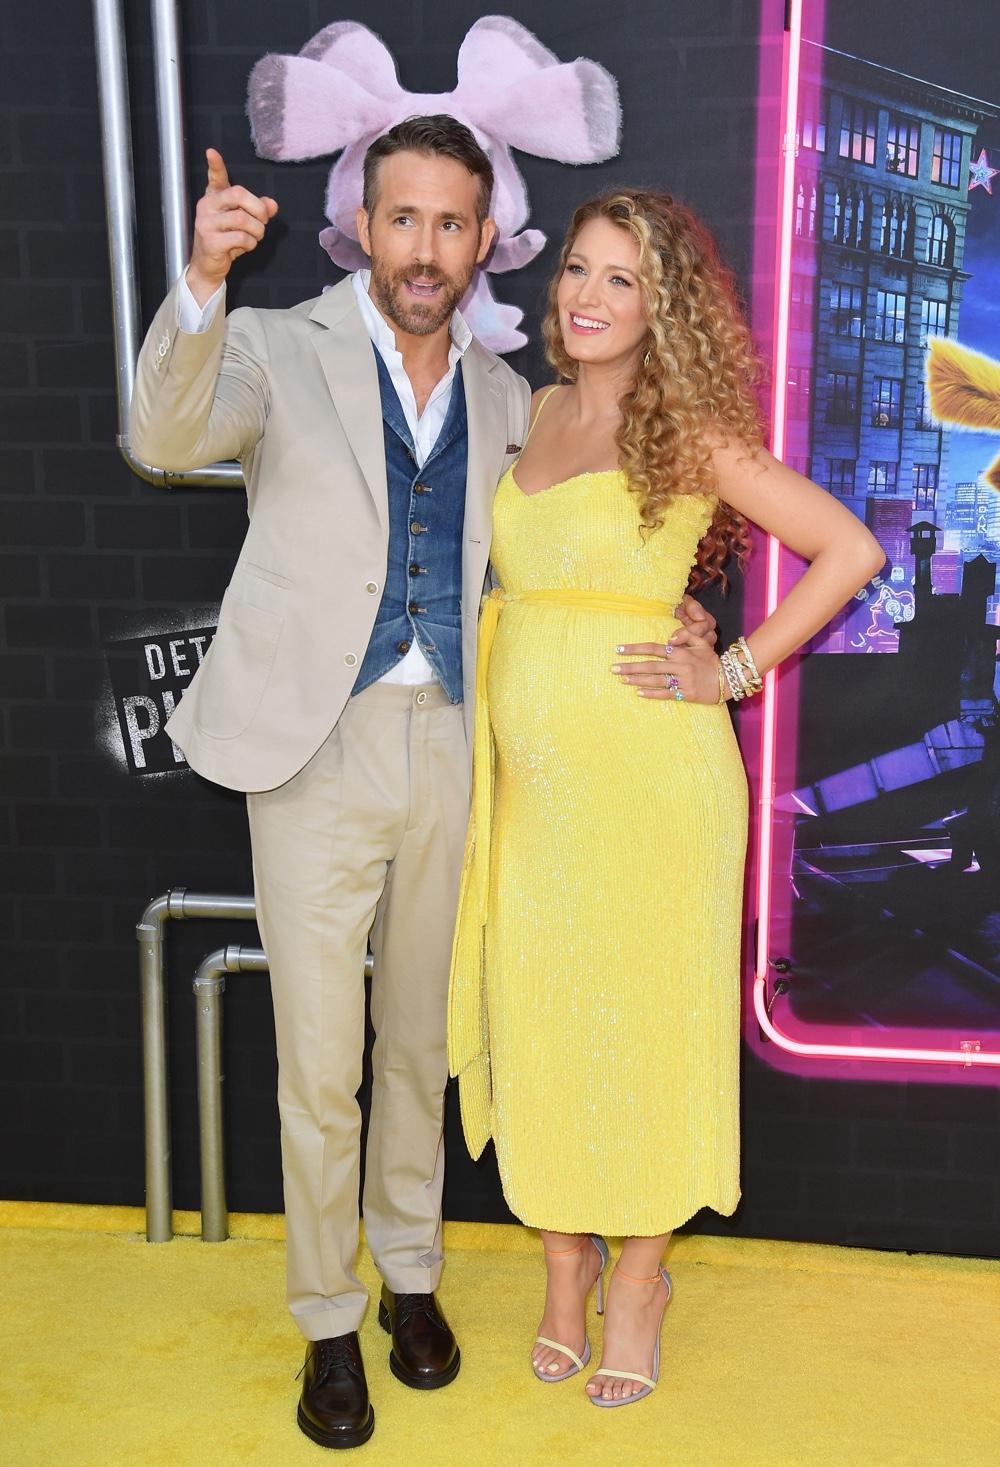 Blake Lively喜怀三胎,出席皮卡丘首映礼同款黄裙亮相